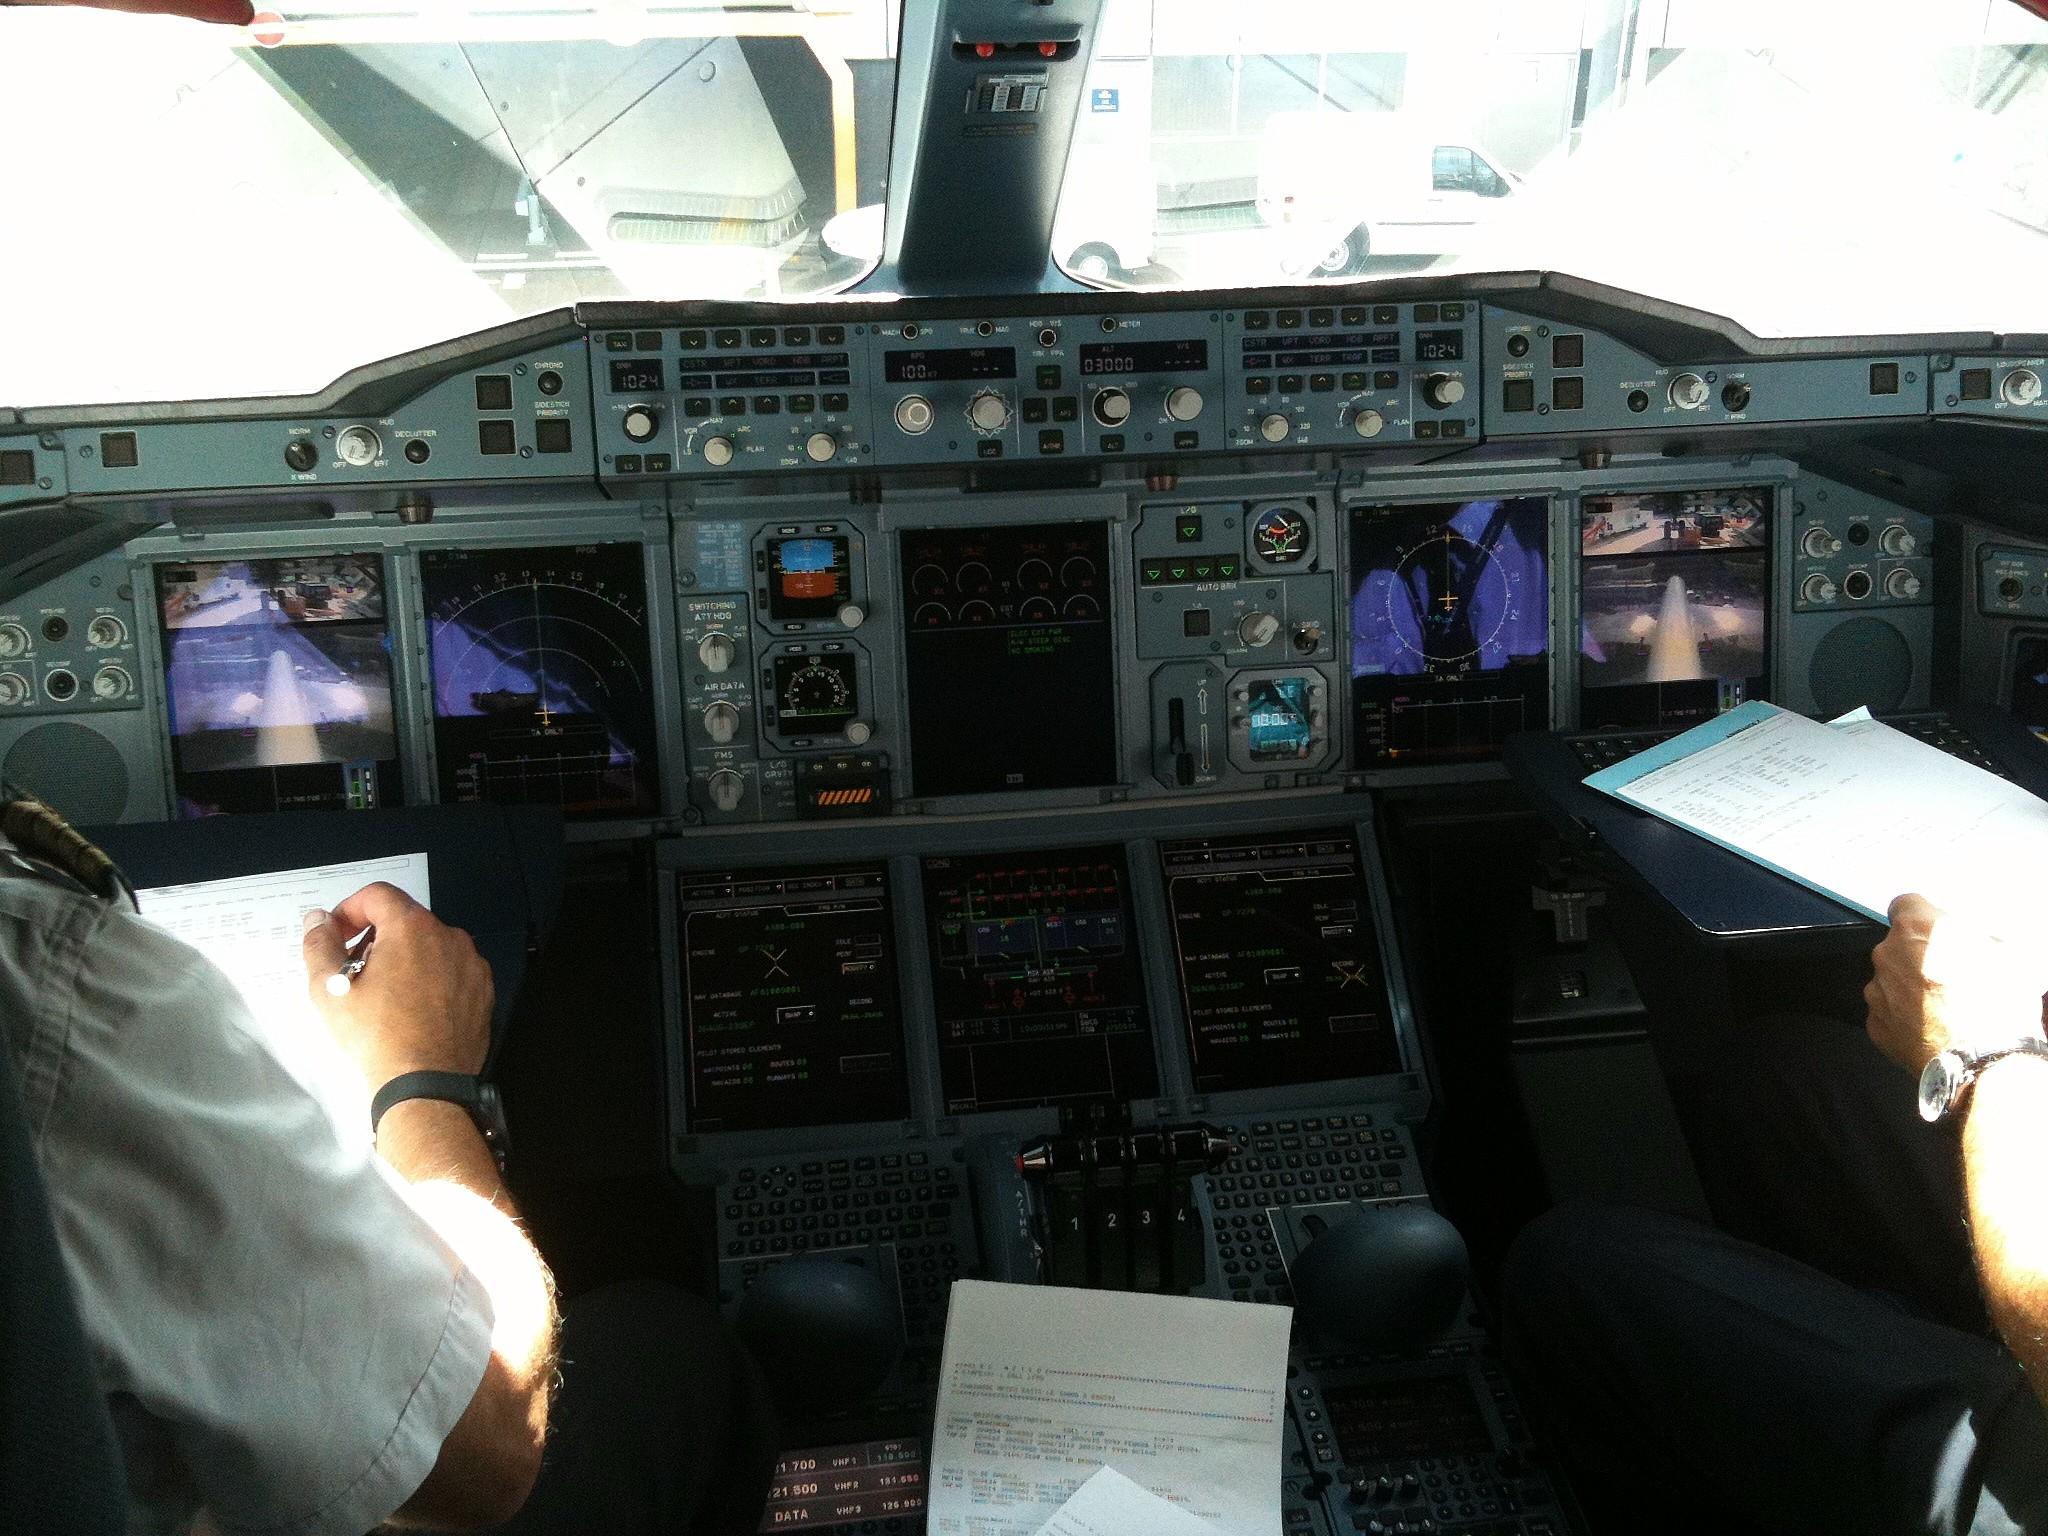 File:Cockpit of Air France A380.jpg